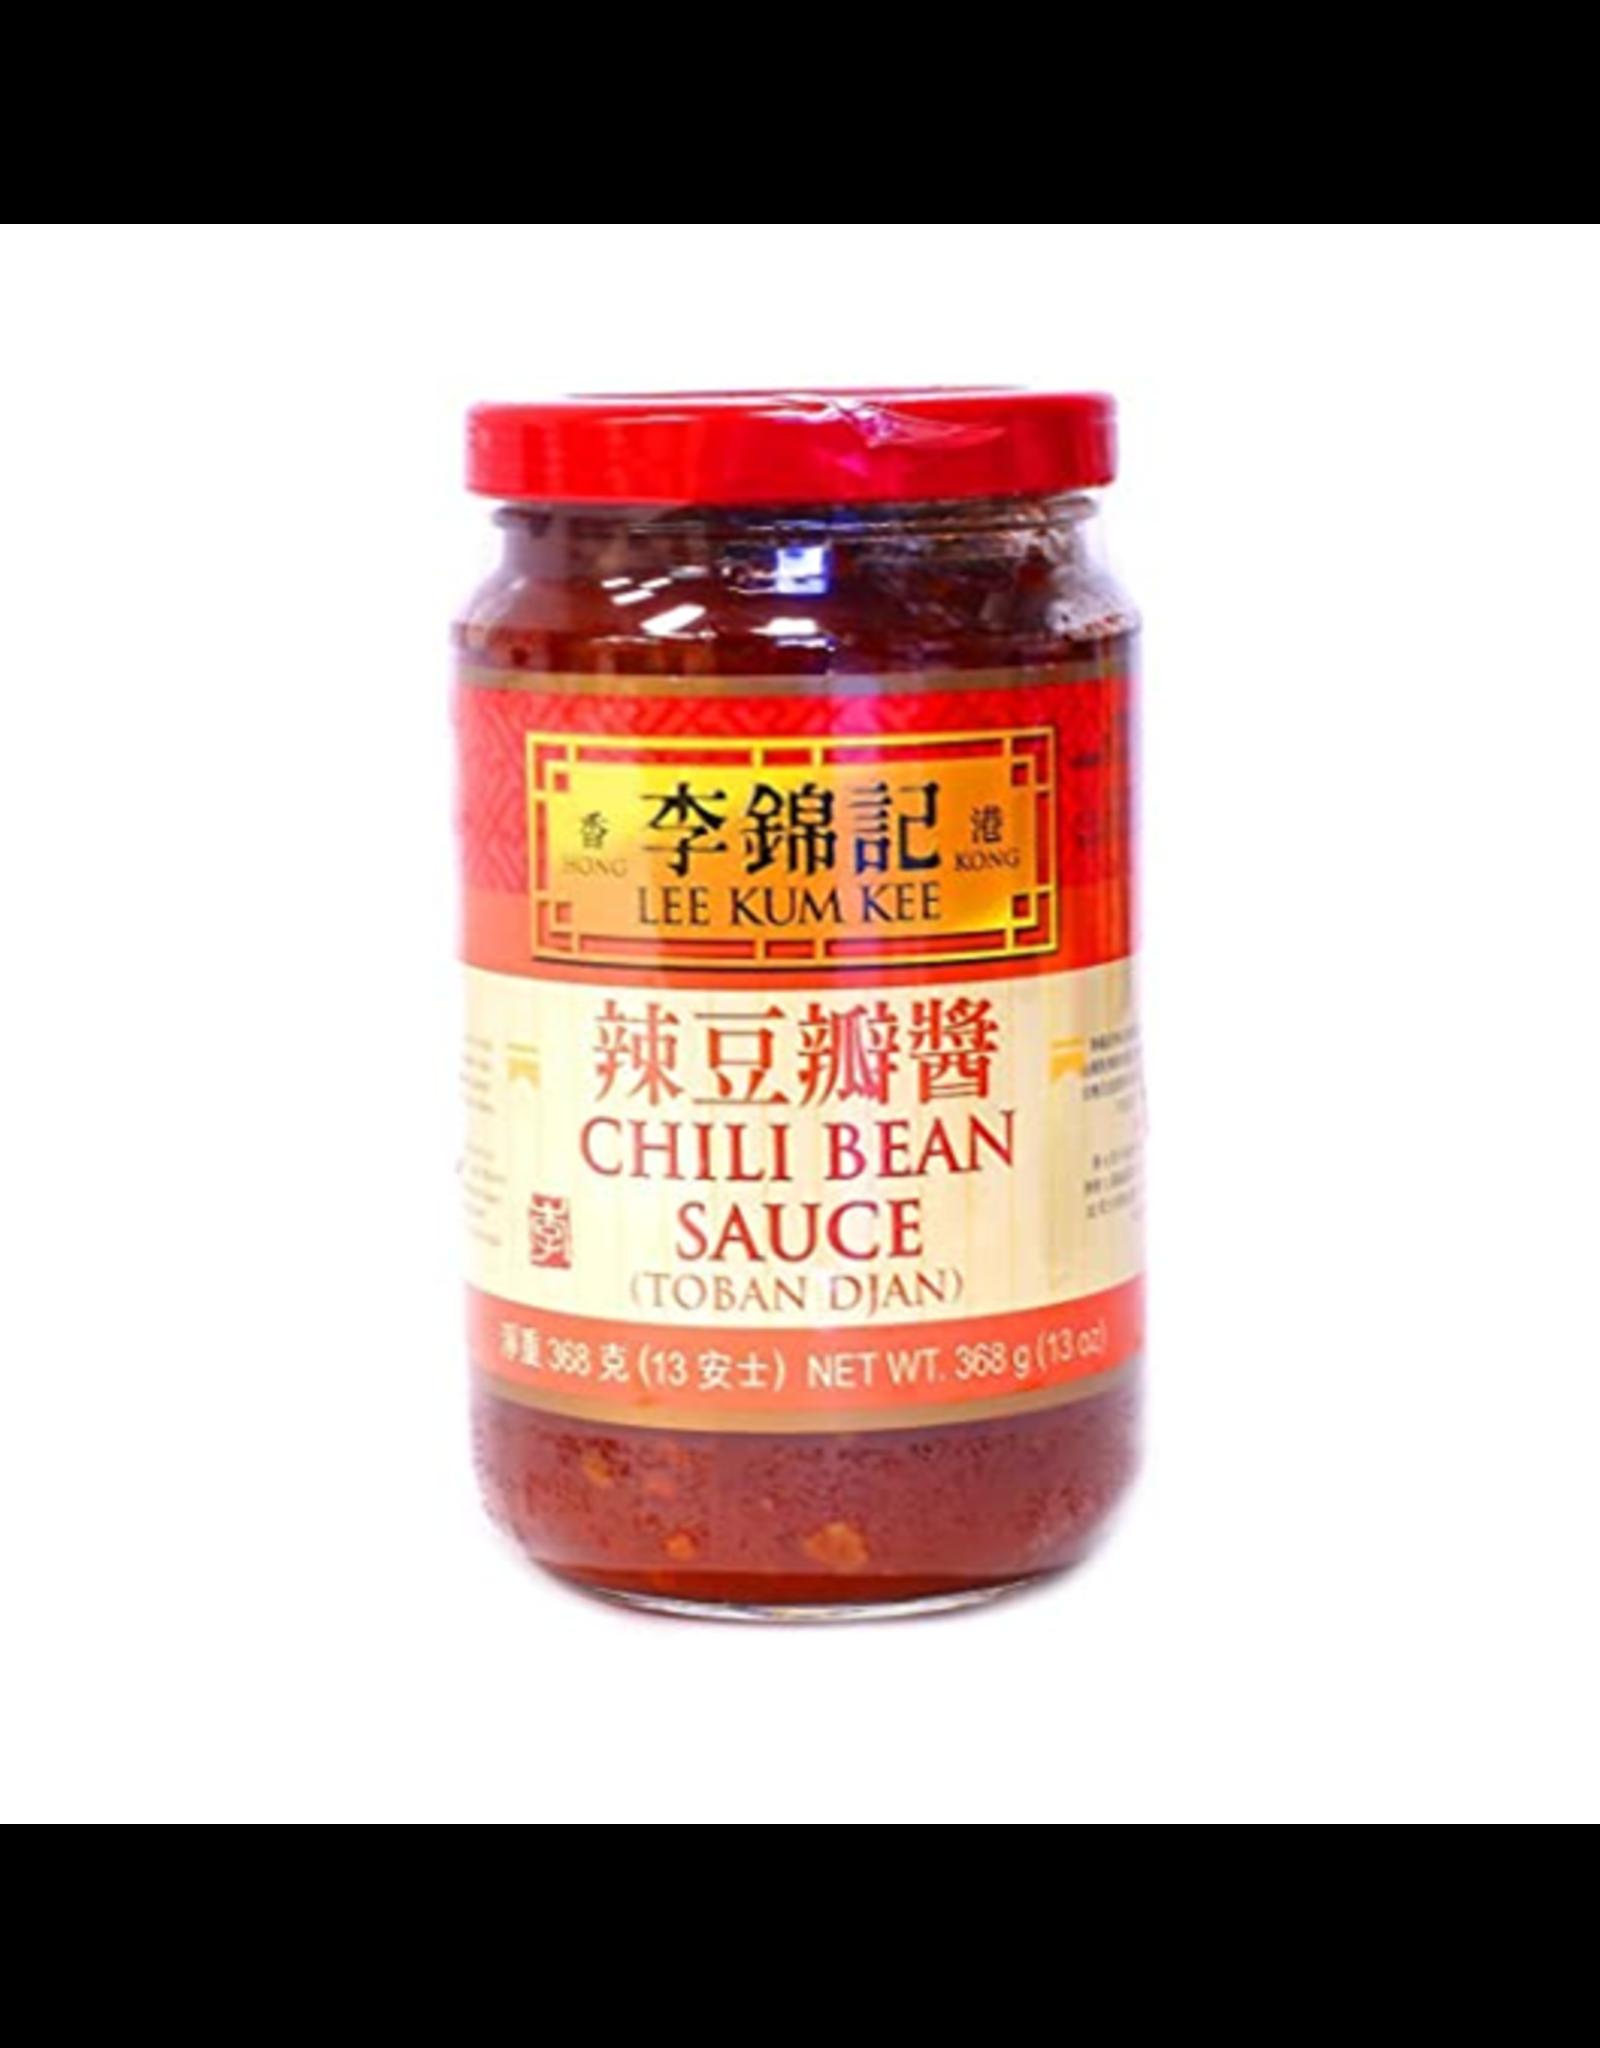 Lee Kum Kee Chili Bean sauce